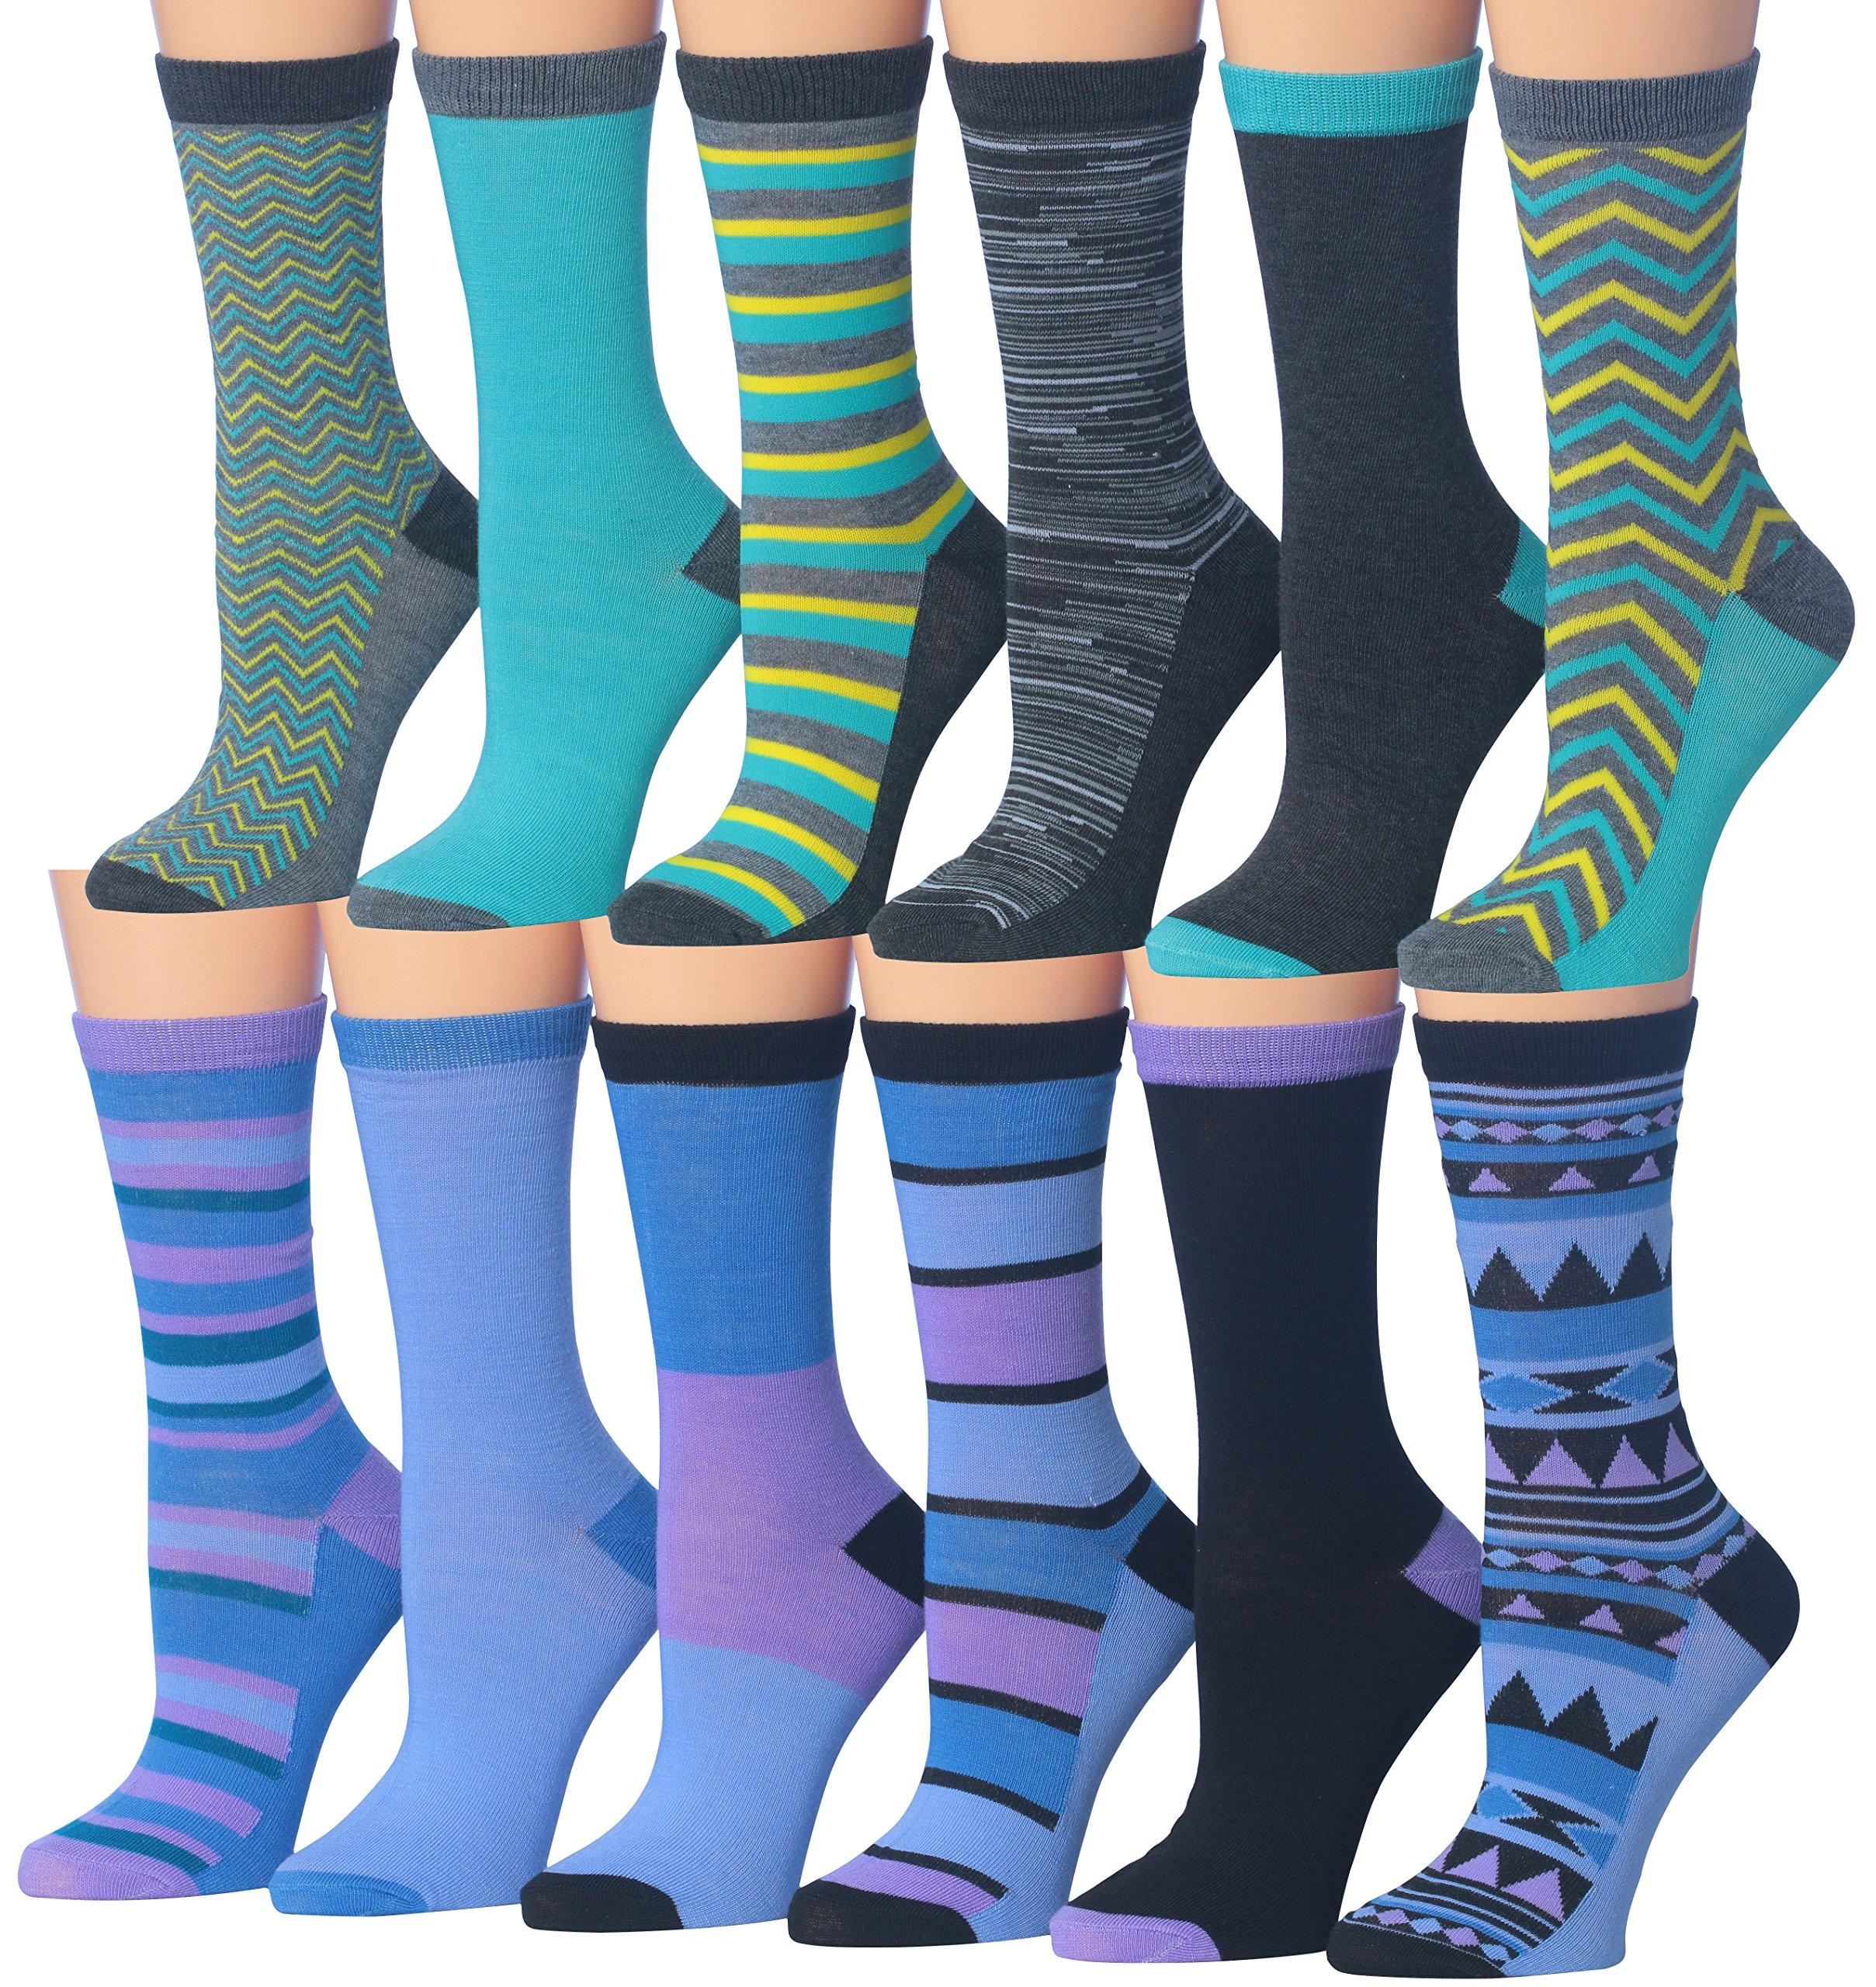 Tipi Toe Women's Ladies 12 Pairs Colorful Funky Fashion Blue Purple Crew Socks, (sock size 9-11) Fits shoe size 5-9, WC29-AB